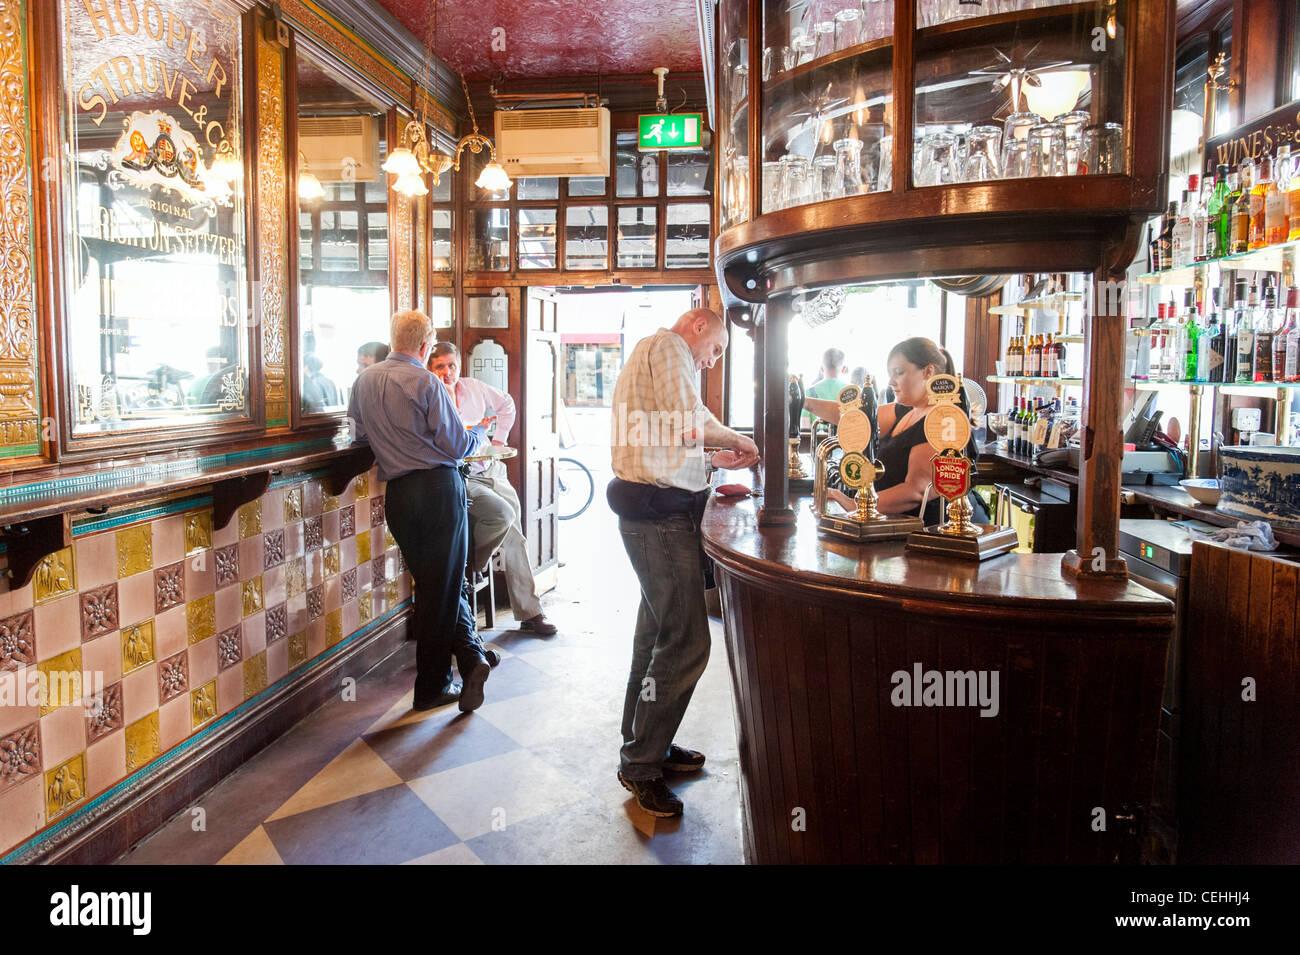 Le chien et le canard pub, Soho, London, England, UK Photo Stock